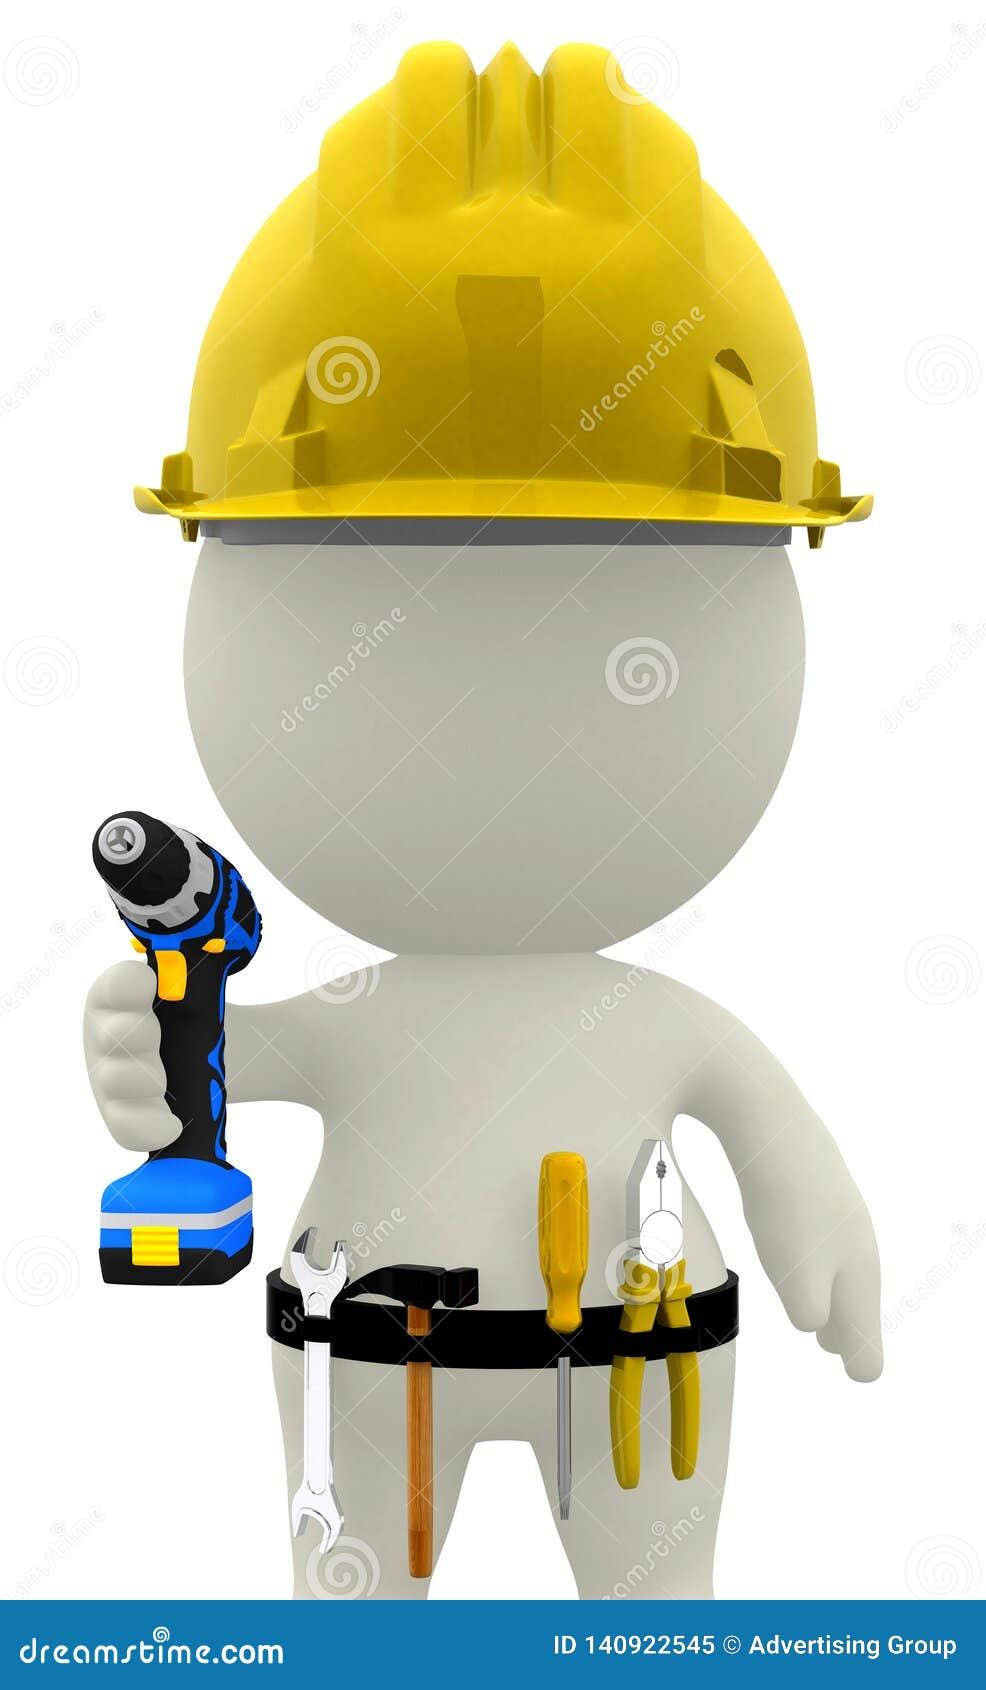 Pracownik budowlany, 3D ilustracja, 3D odpłaca się